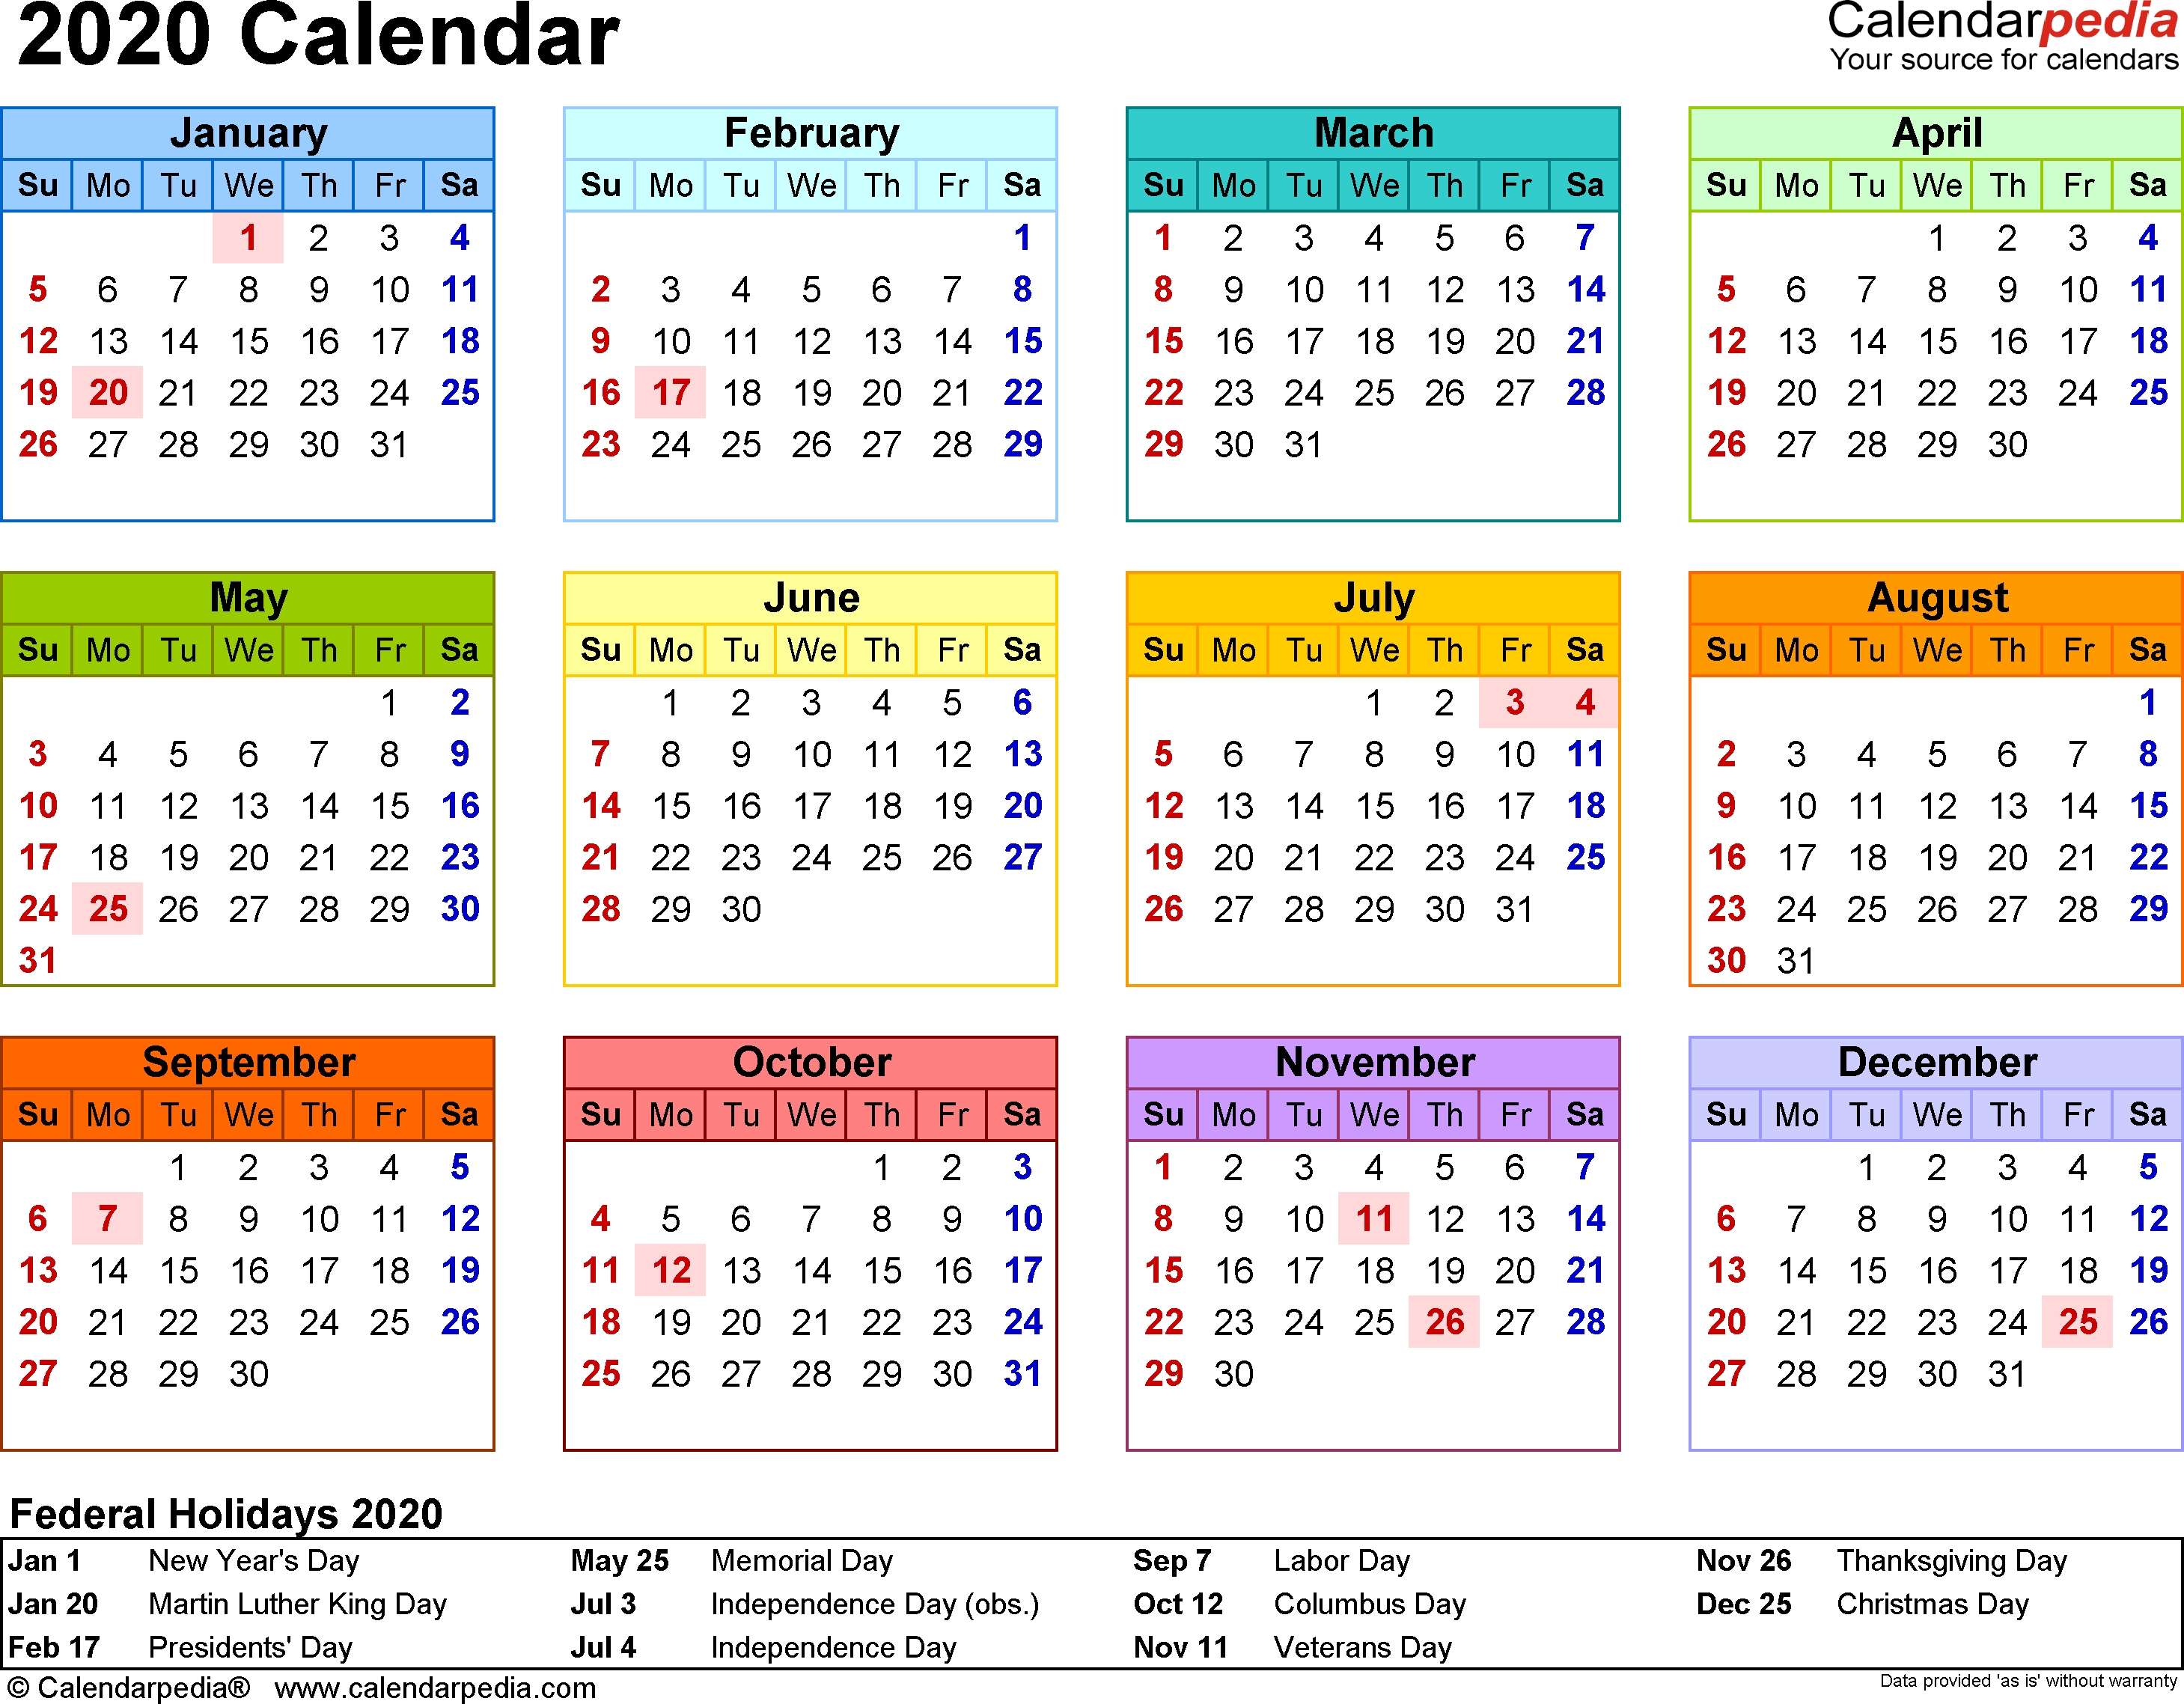 2020 Calendar - 18 Free Printable Word Calendar Templates-Calendar Templates 3 Months Per Page 2020